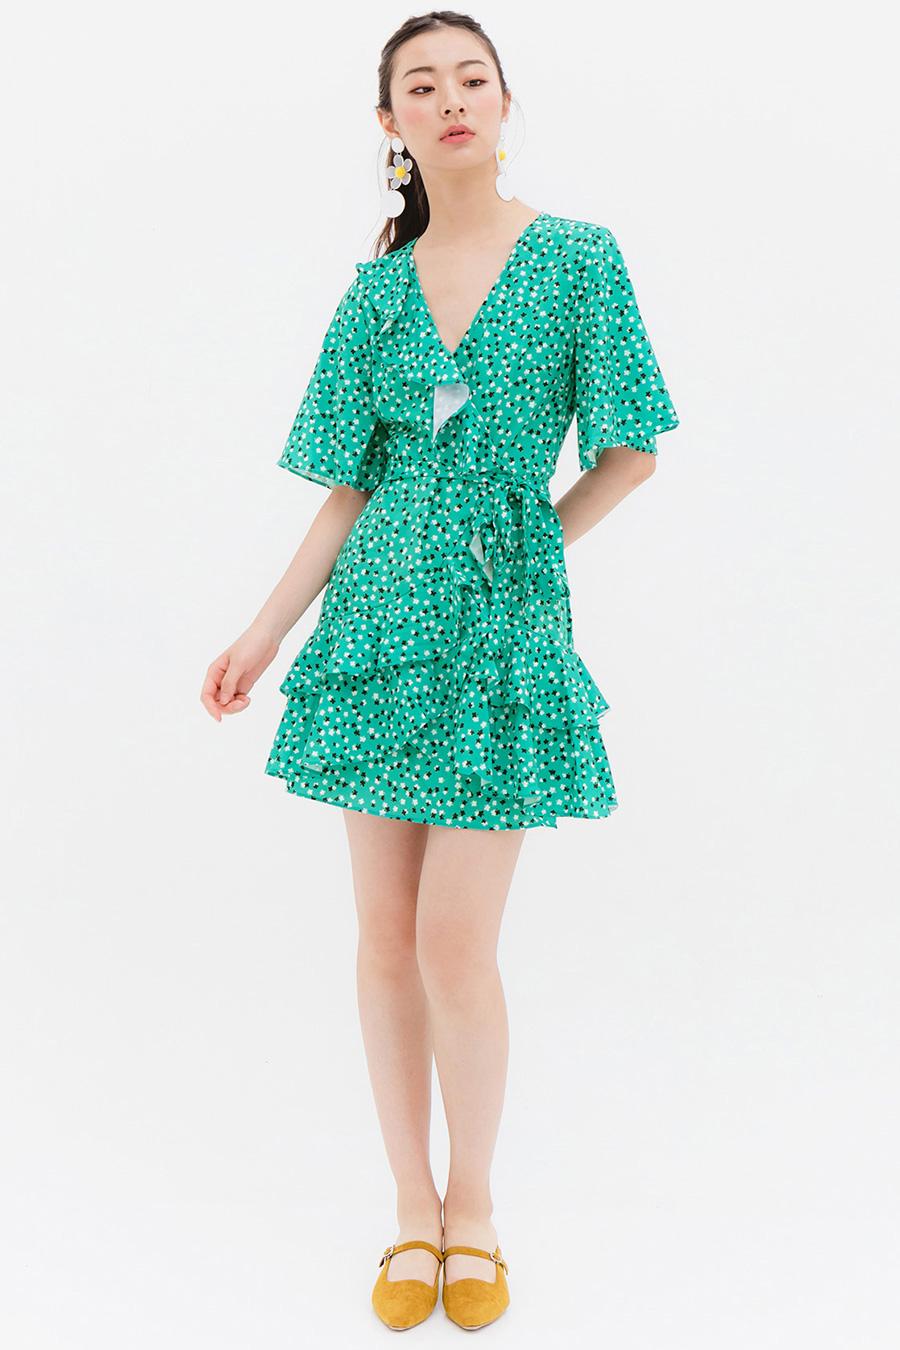 SHEVA DRESS - EMERALD